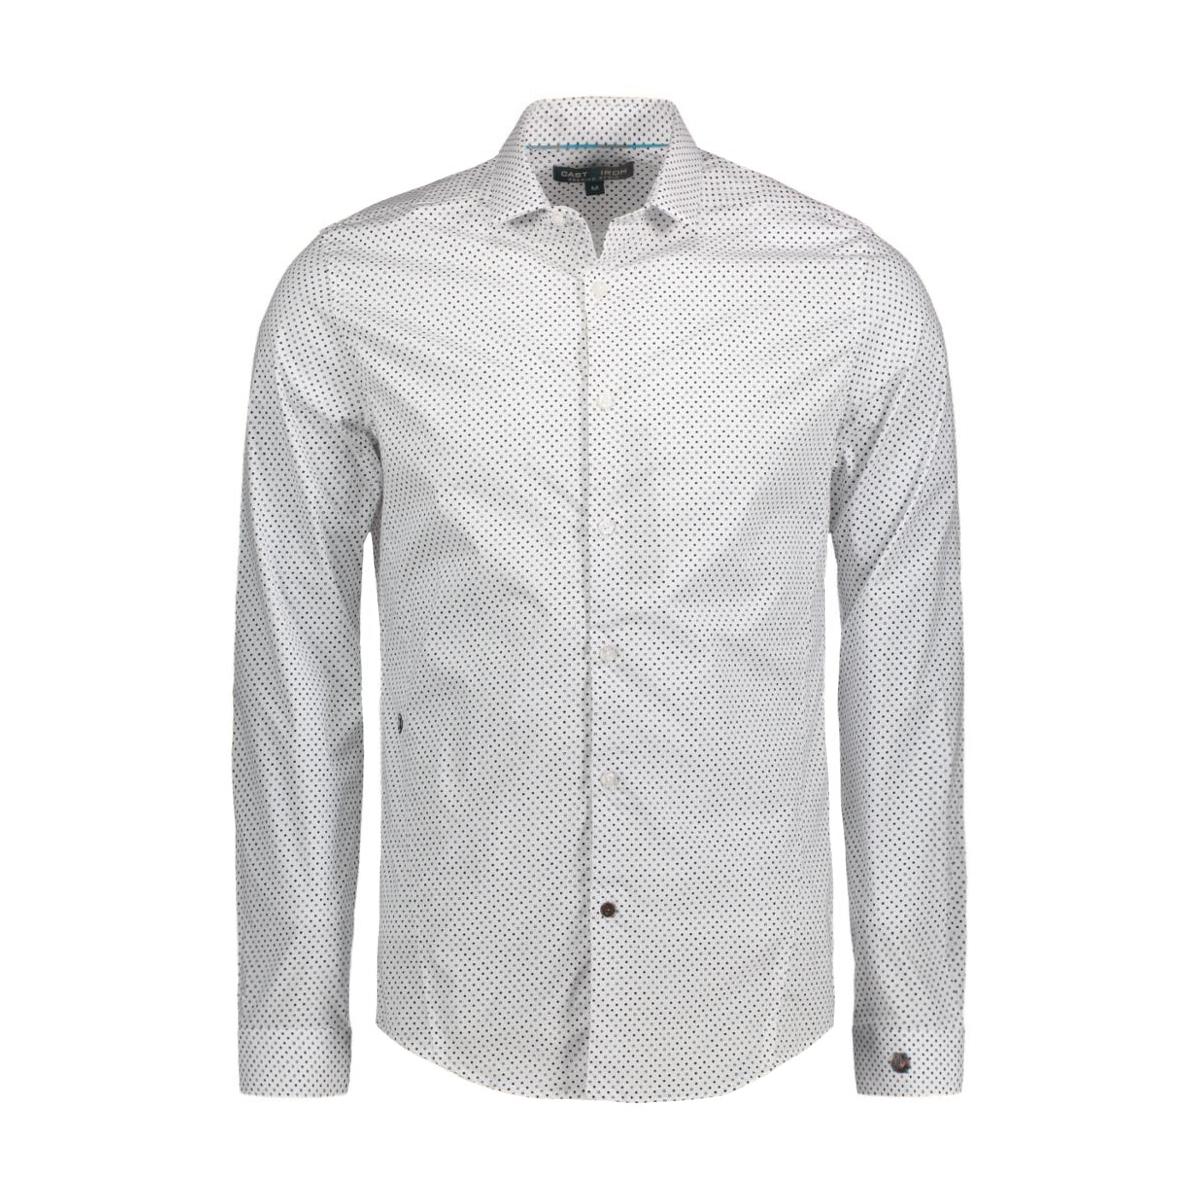 csi65614 cast iron overhemd 900